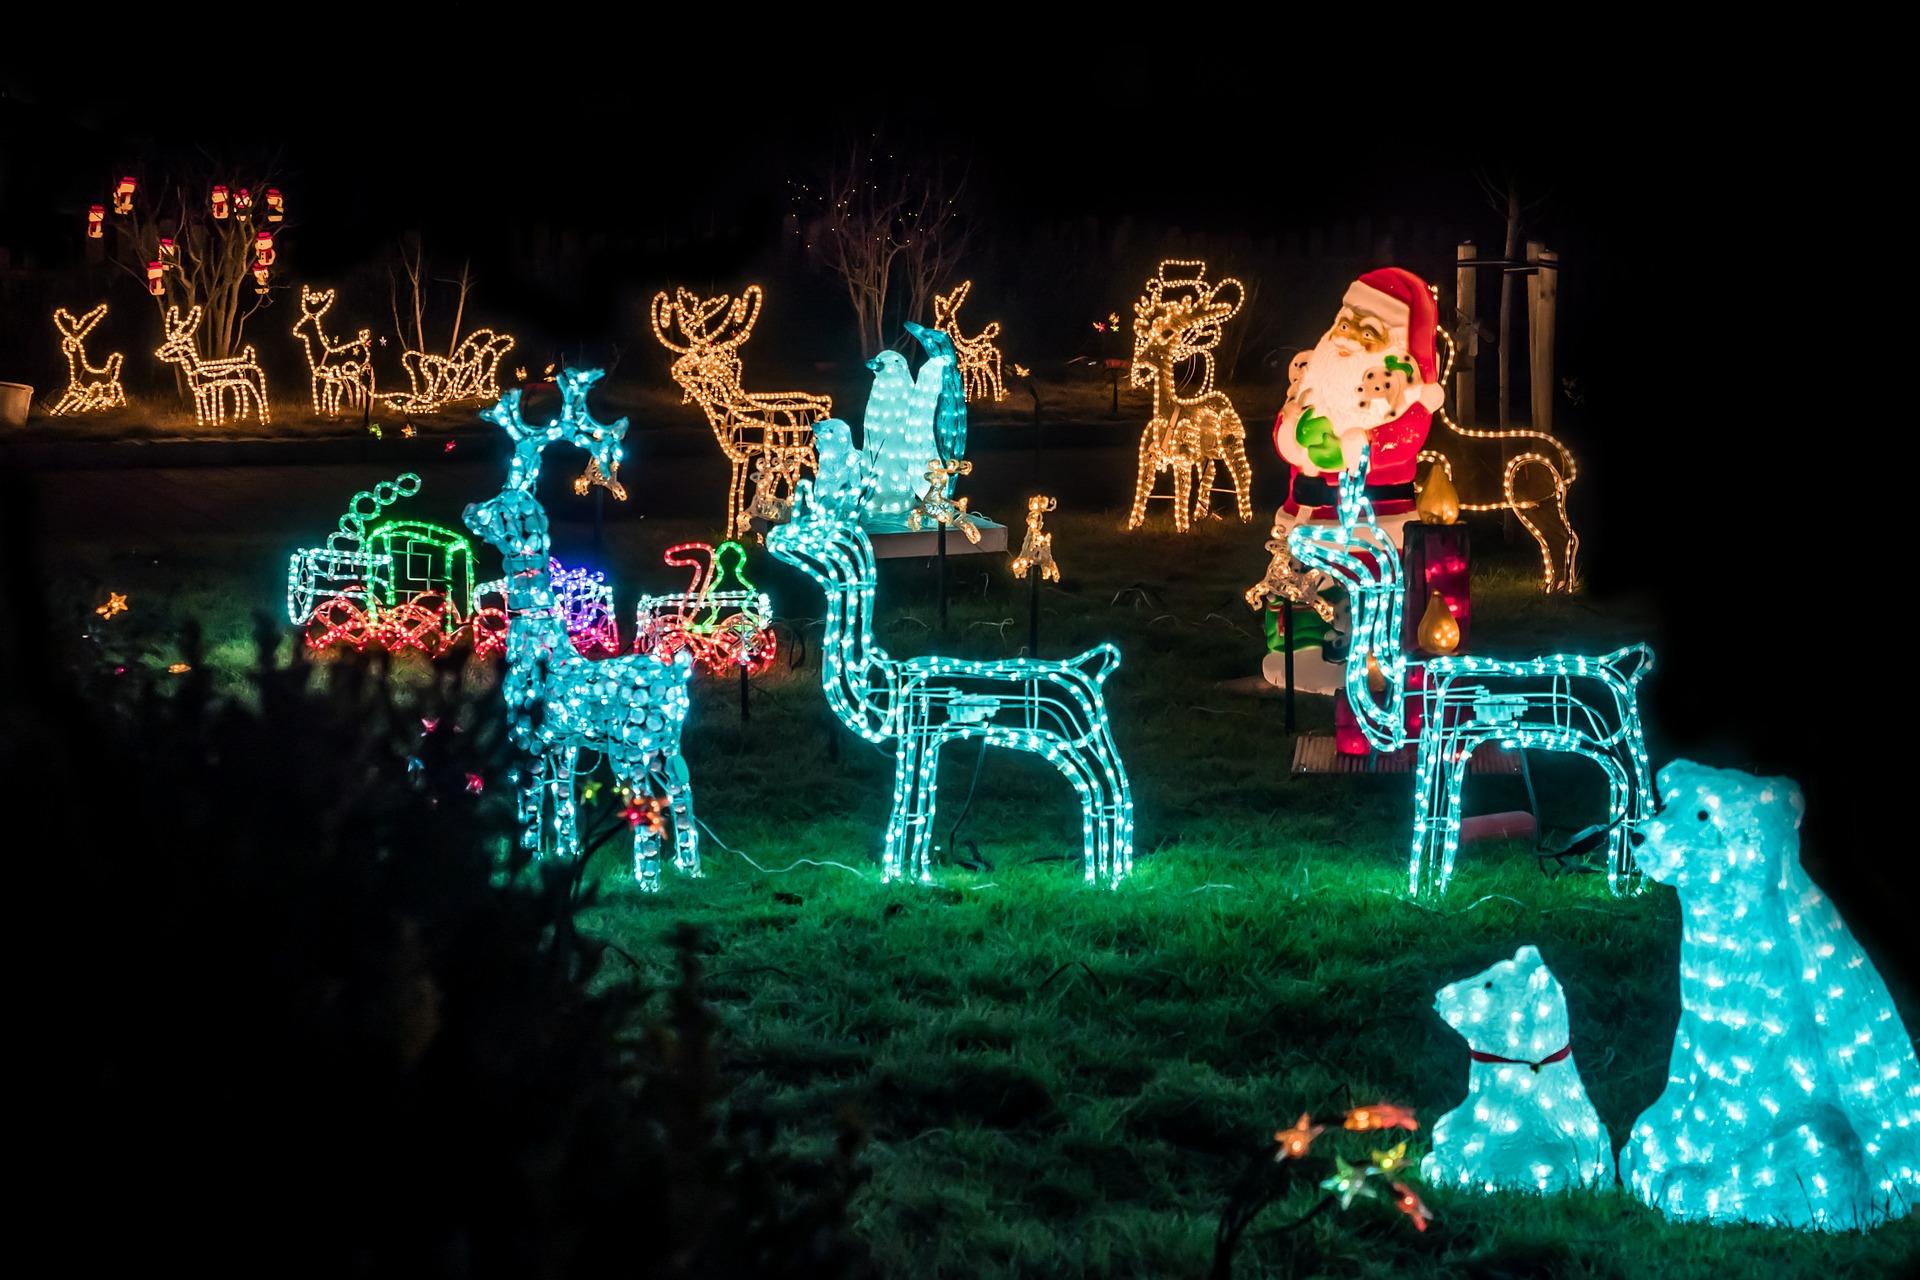 Weihnachtsbeleuchtung Im Garten Kull Design Blog